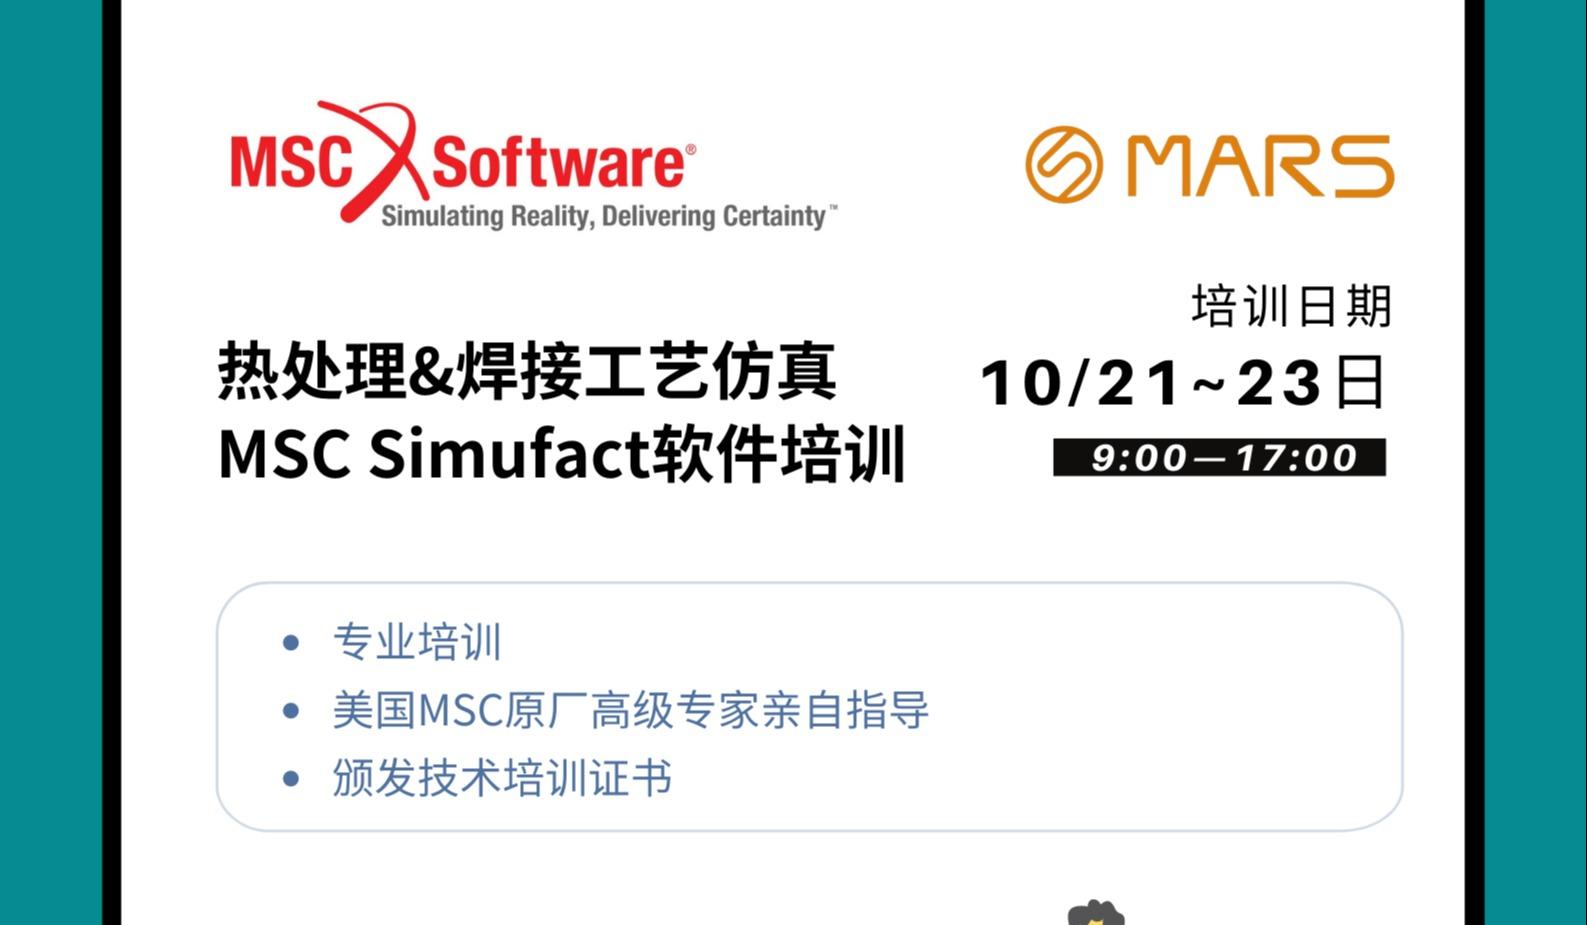 MSC Simufact专业焊接工艺&热处理技术线下培训-公开课